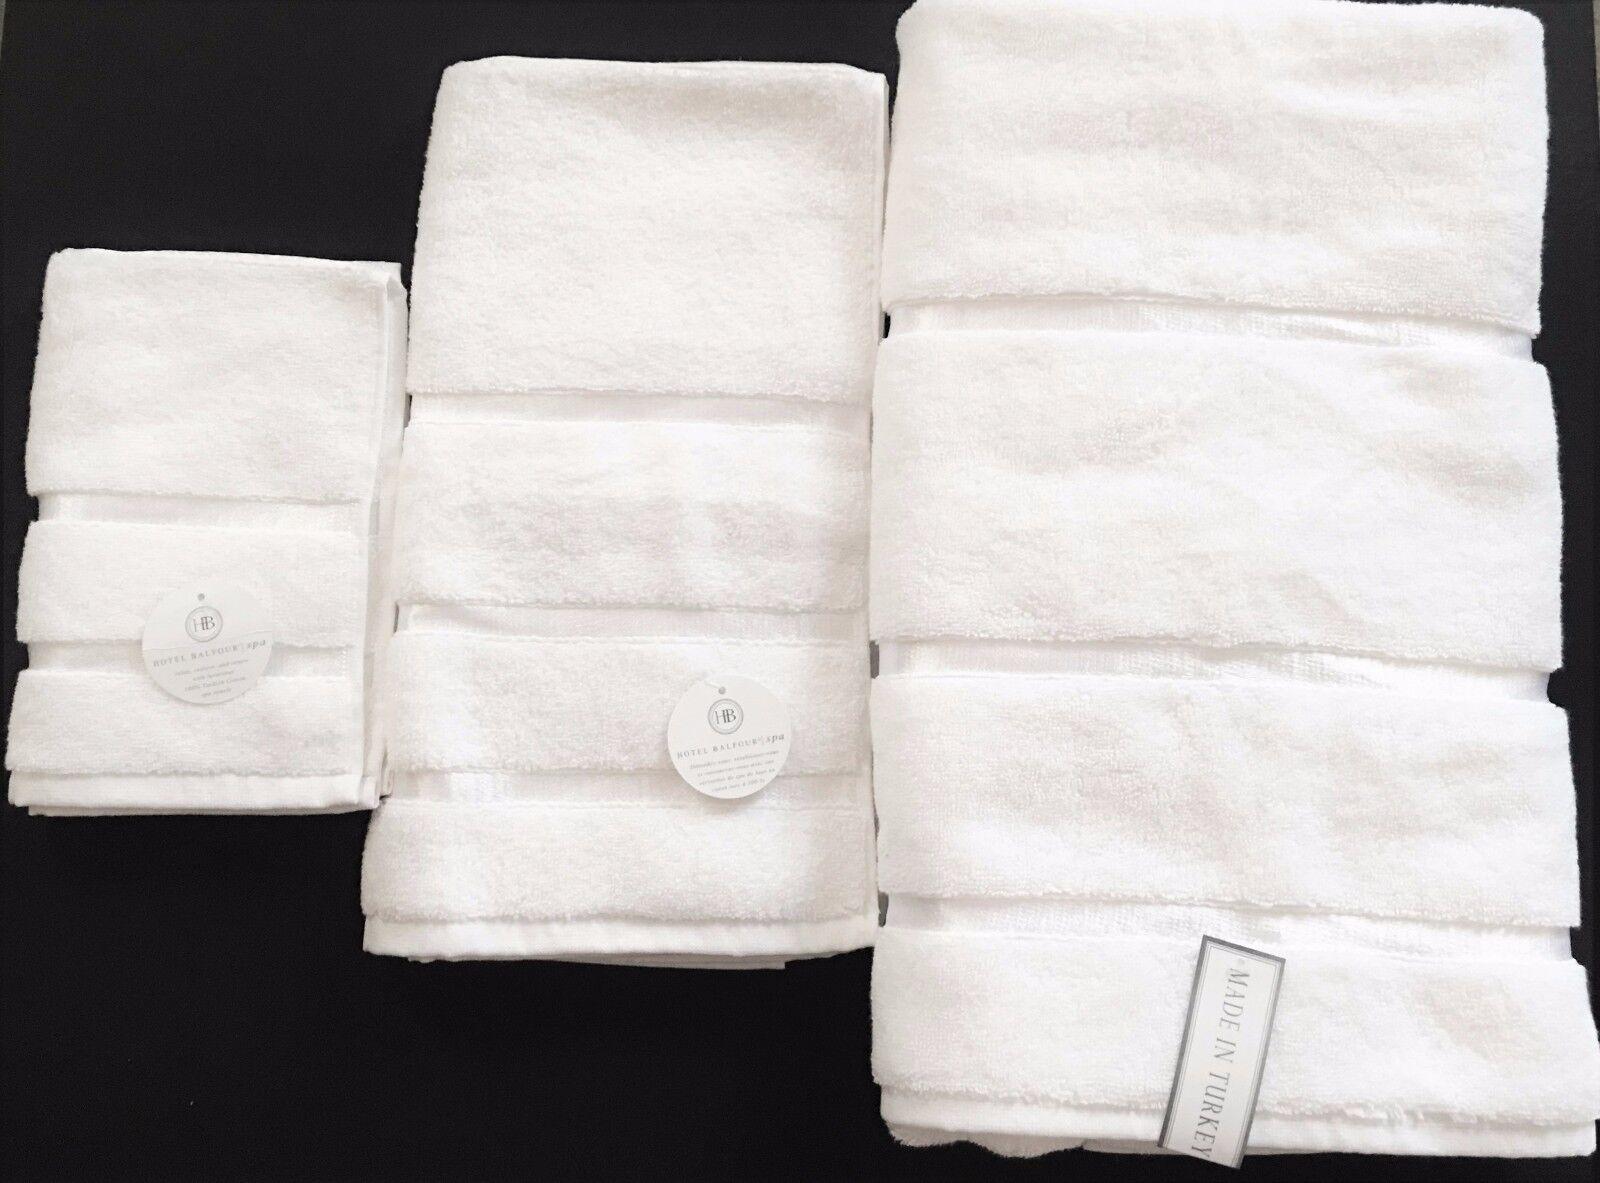 Hotel Balfour 3 Pz Set Bianco Peloso Turco Bagno di Cotone+ Asciugamano+